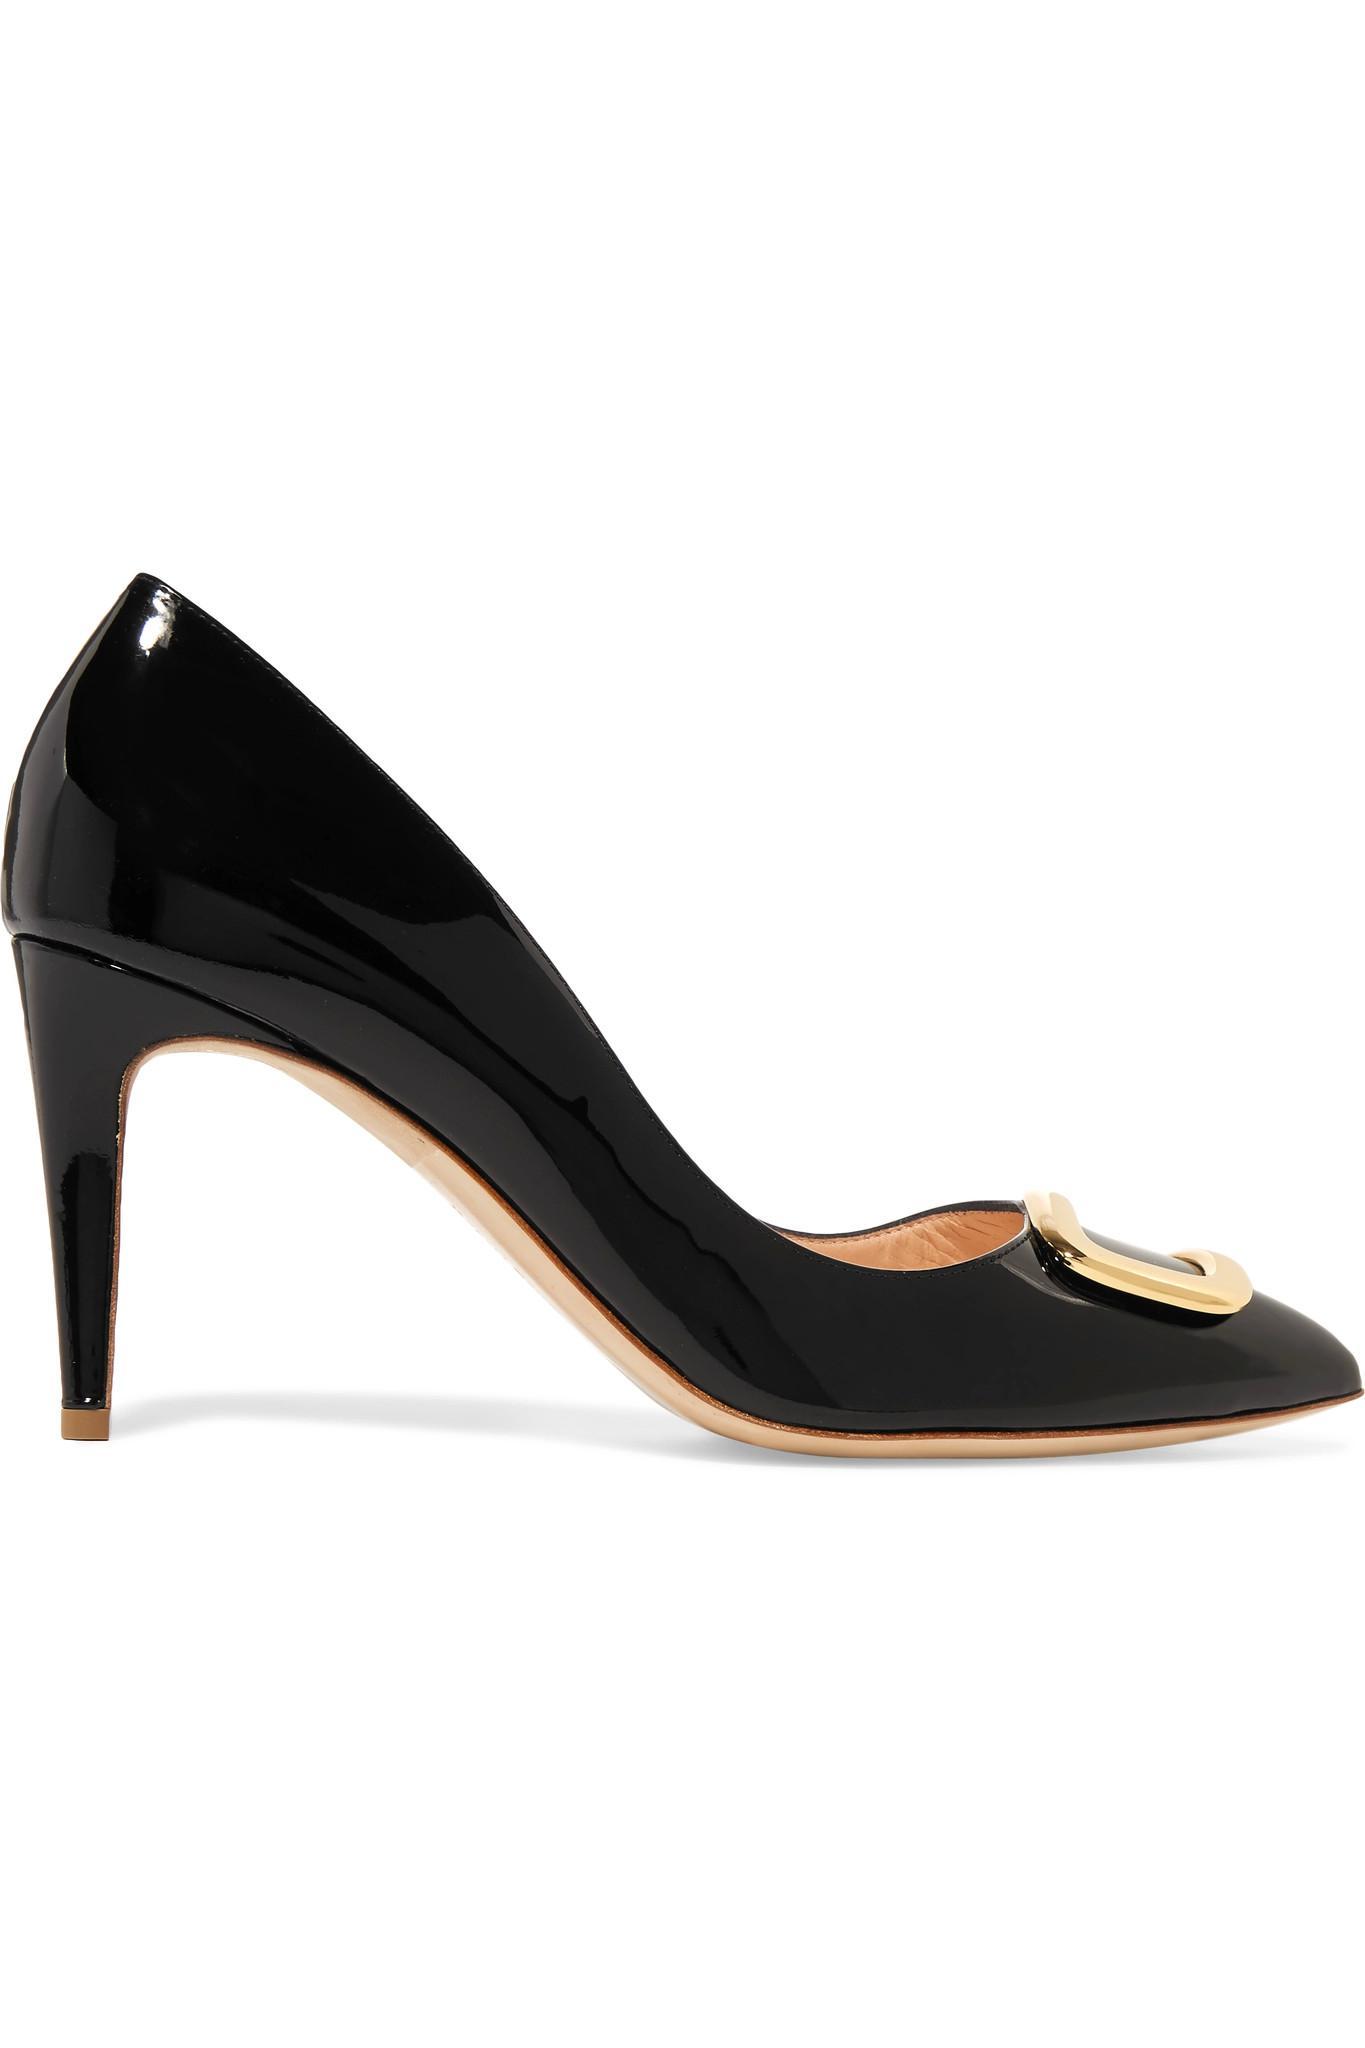 Rupert Sanderson Patent Leather Heels